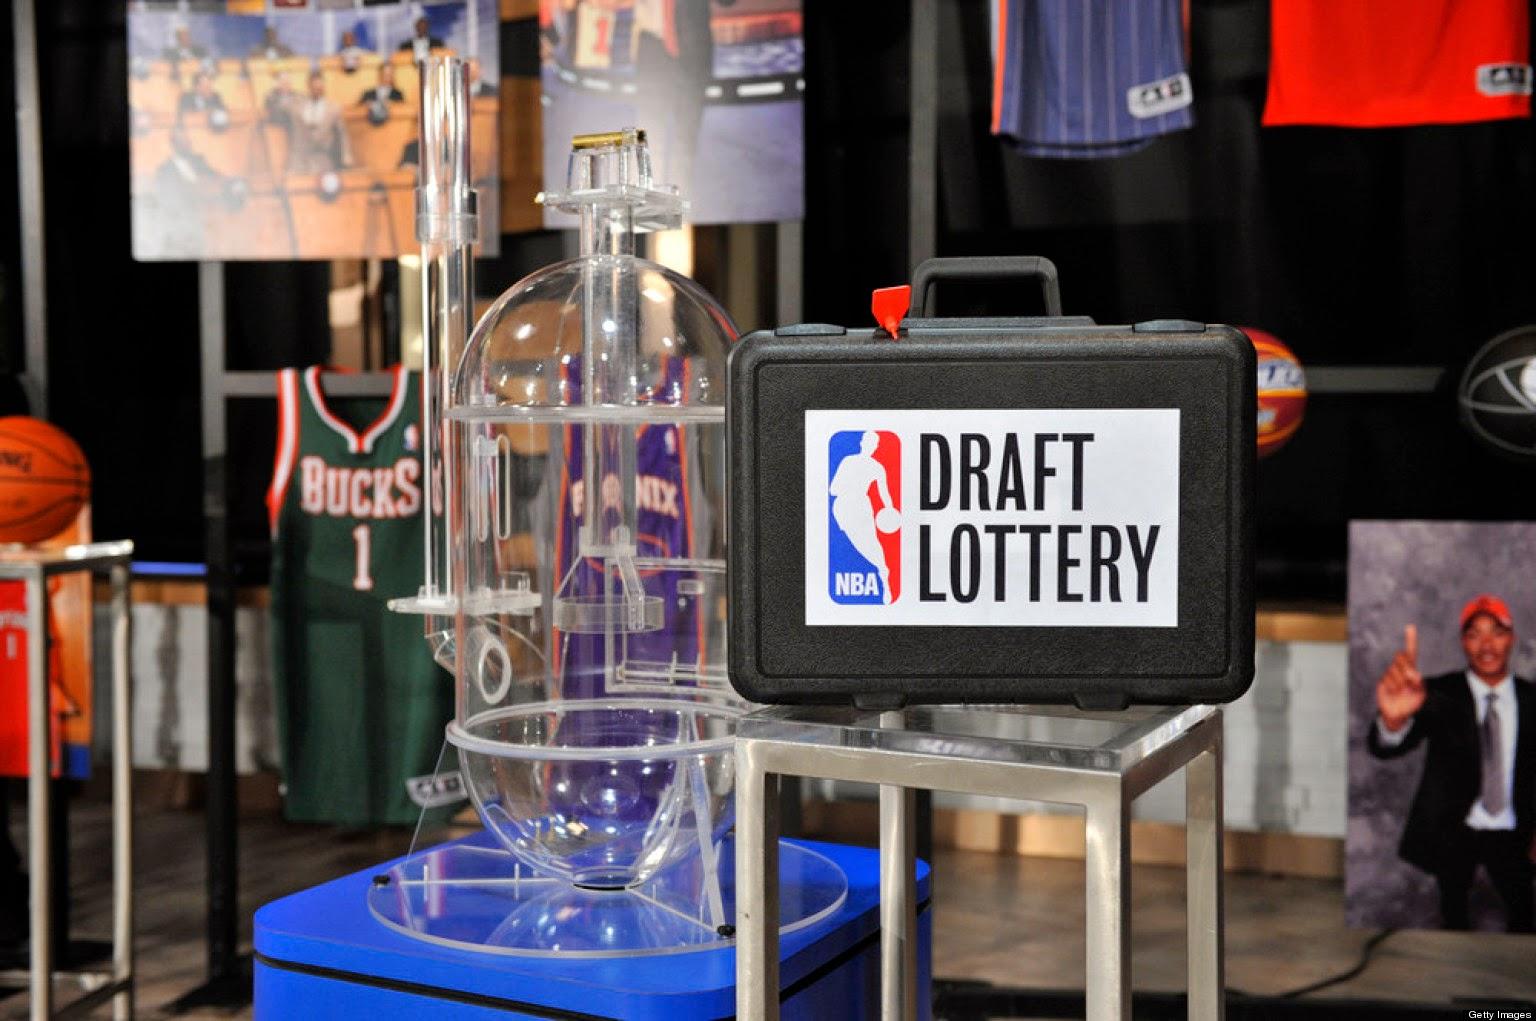 NBA Draft Lottery 2015 - La Hemeroteca NBA